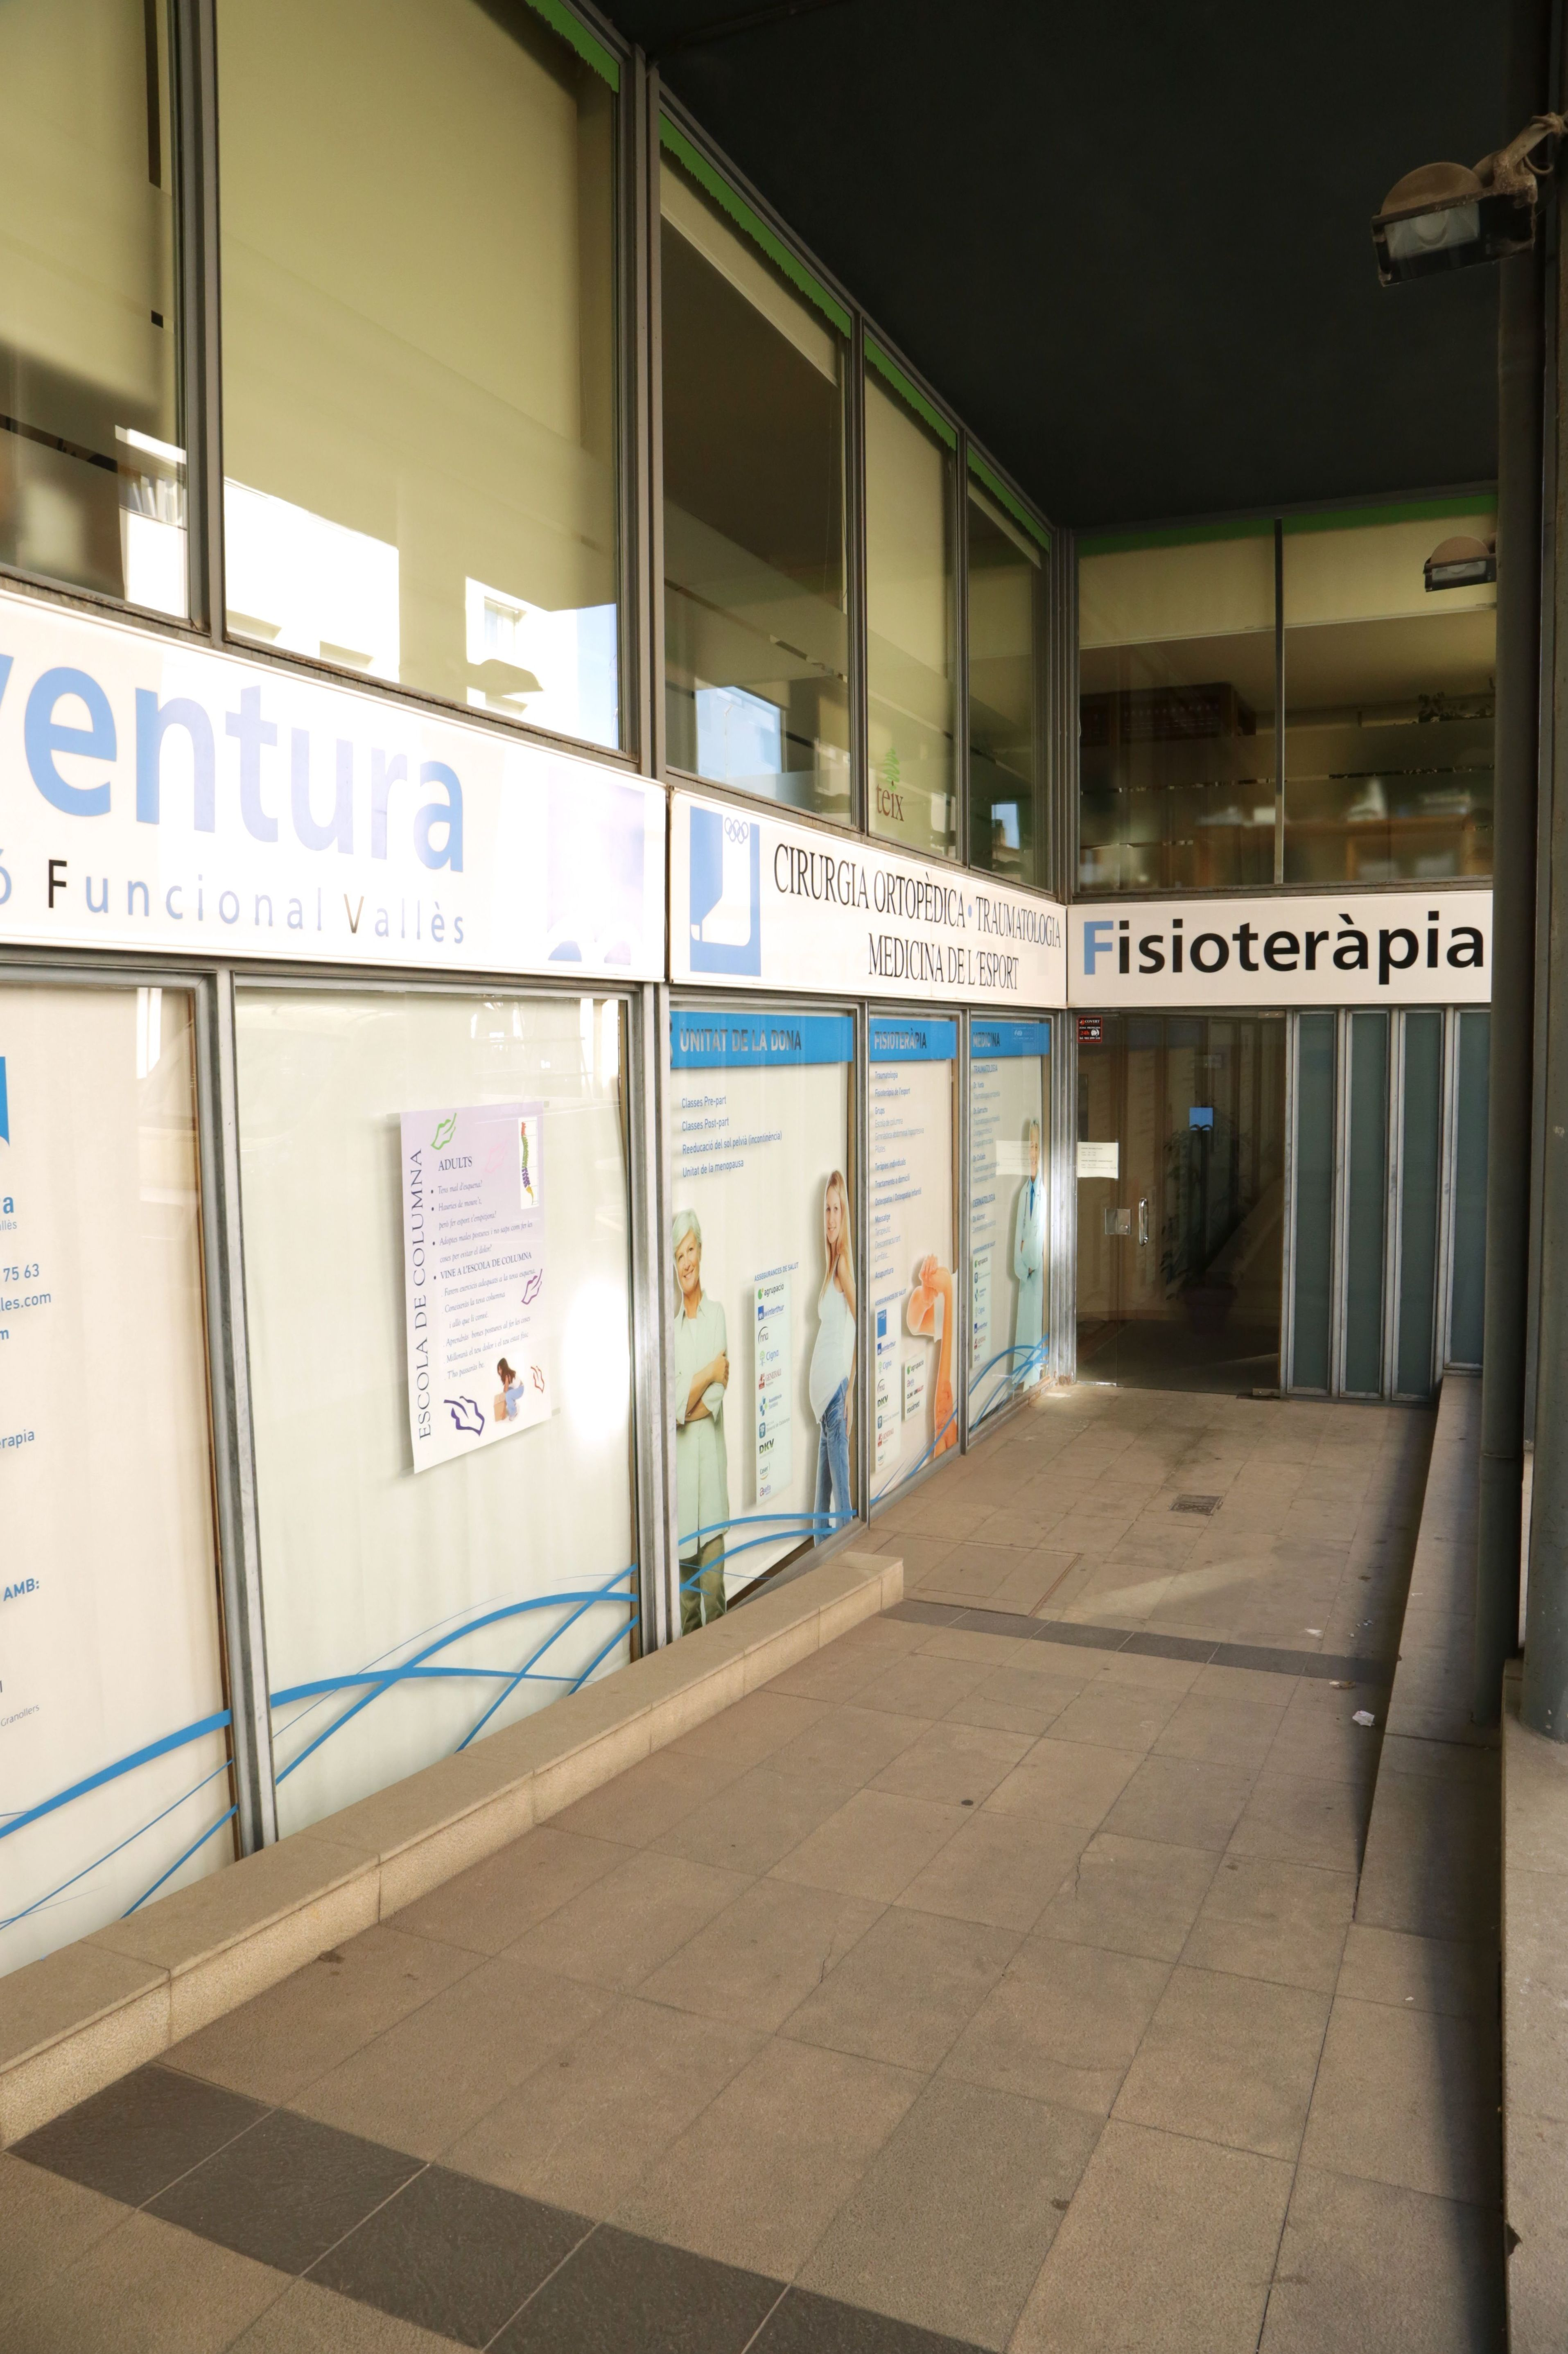 Foto 5 de Fisioterapia en    Centro de Recuperación Funcional Vallés Mercè Ventura